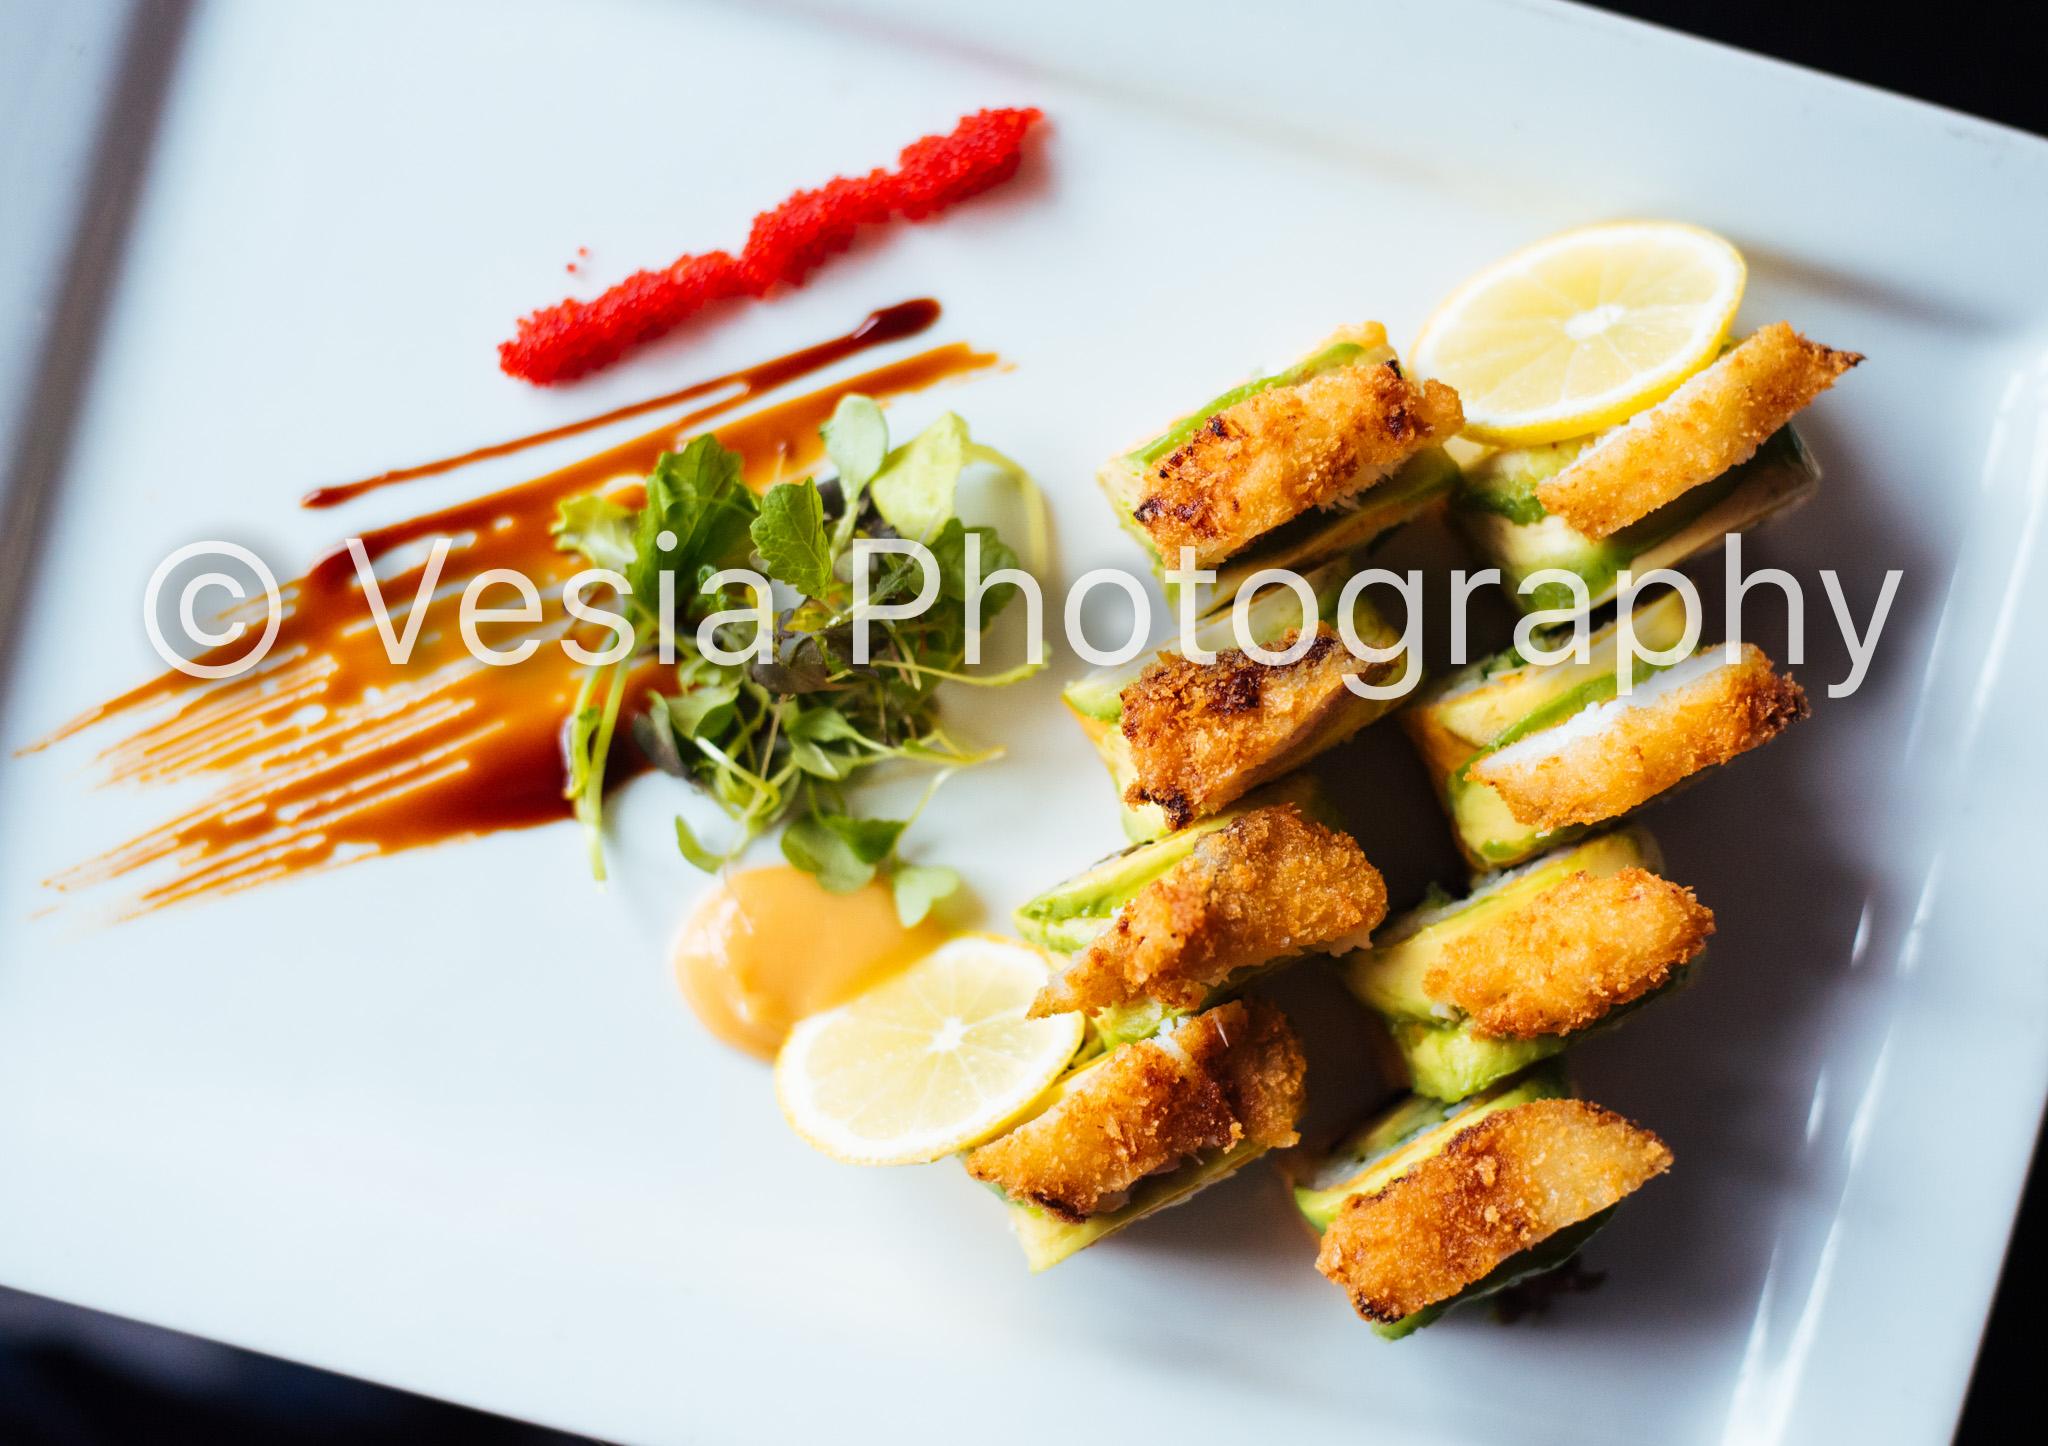 Caviar_Sushi_Proofs-21.jpg